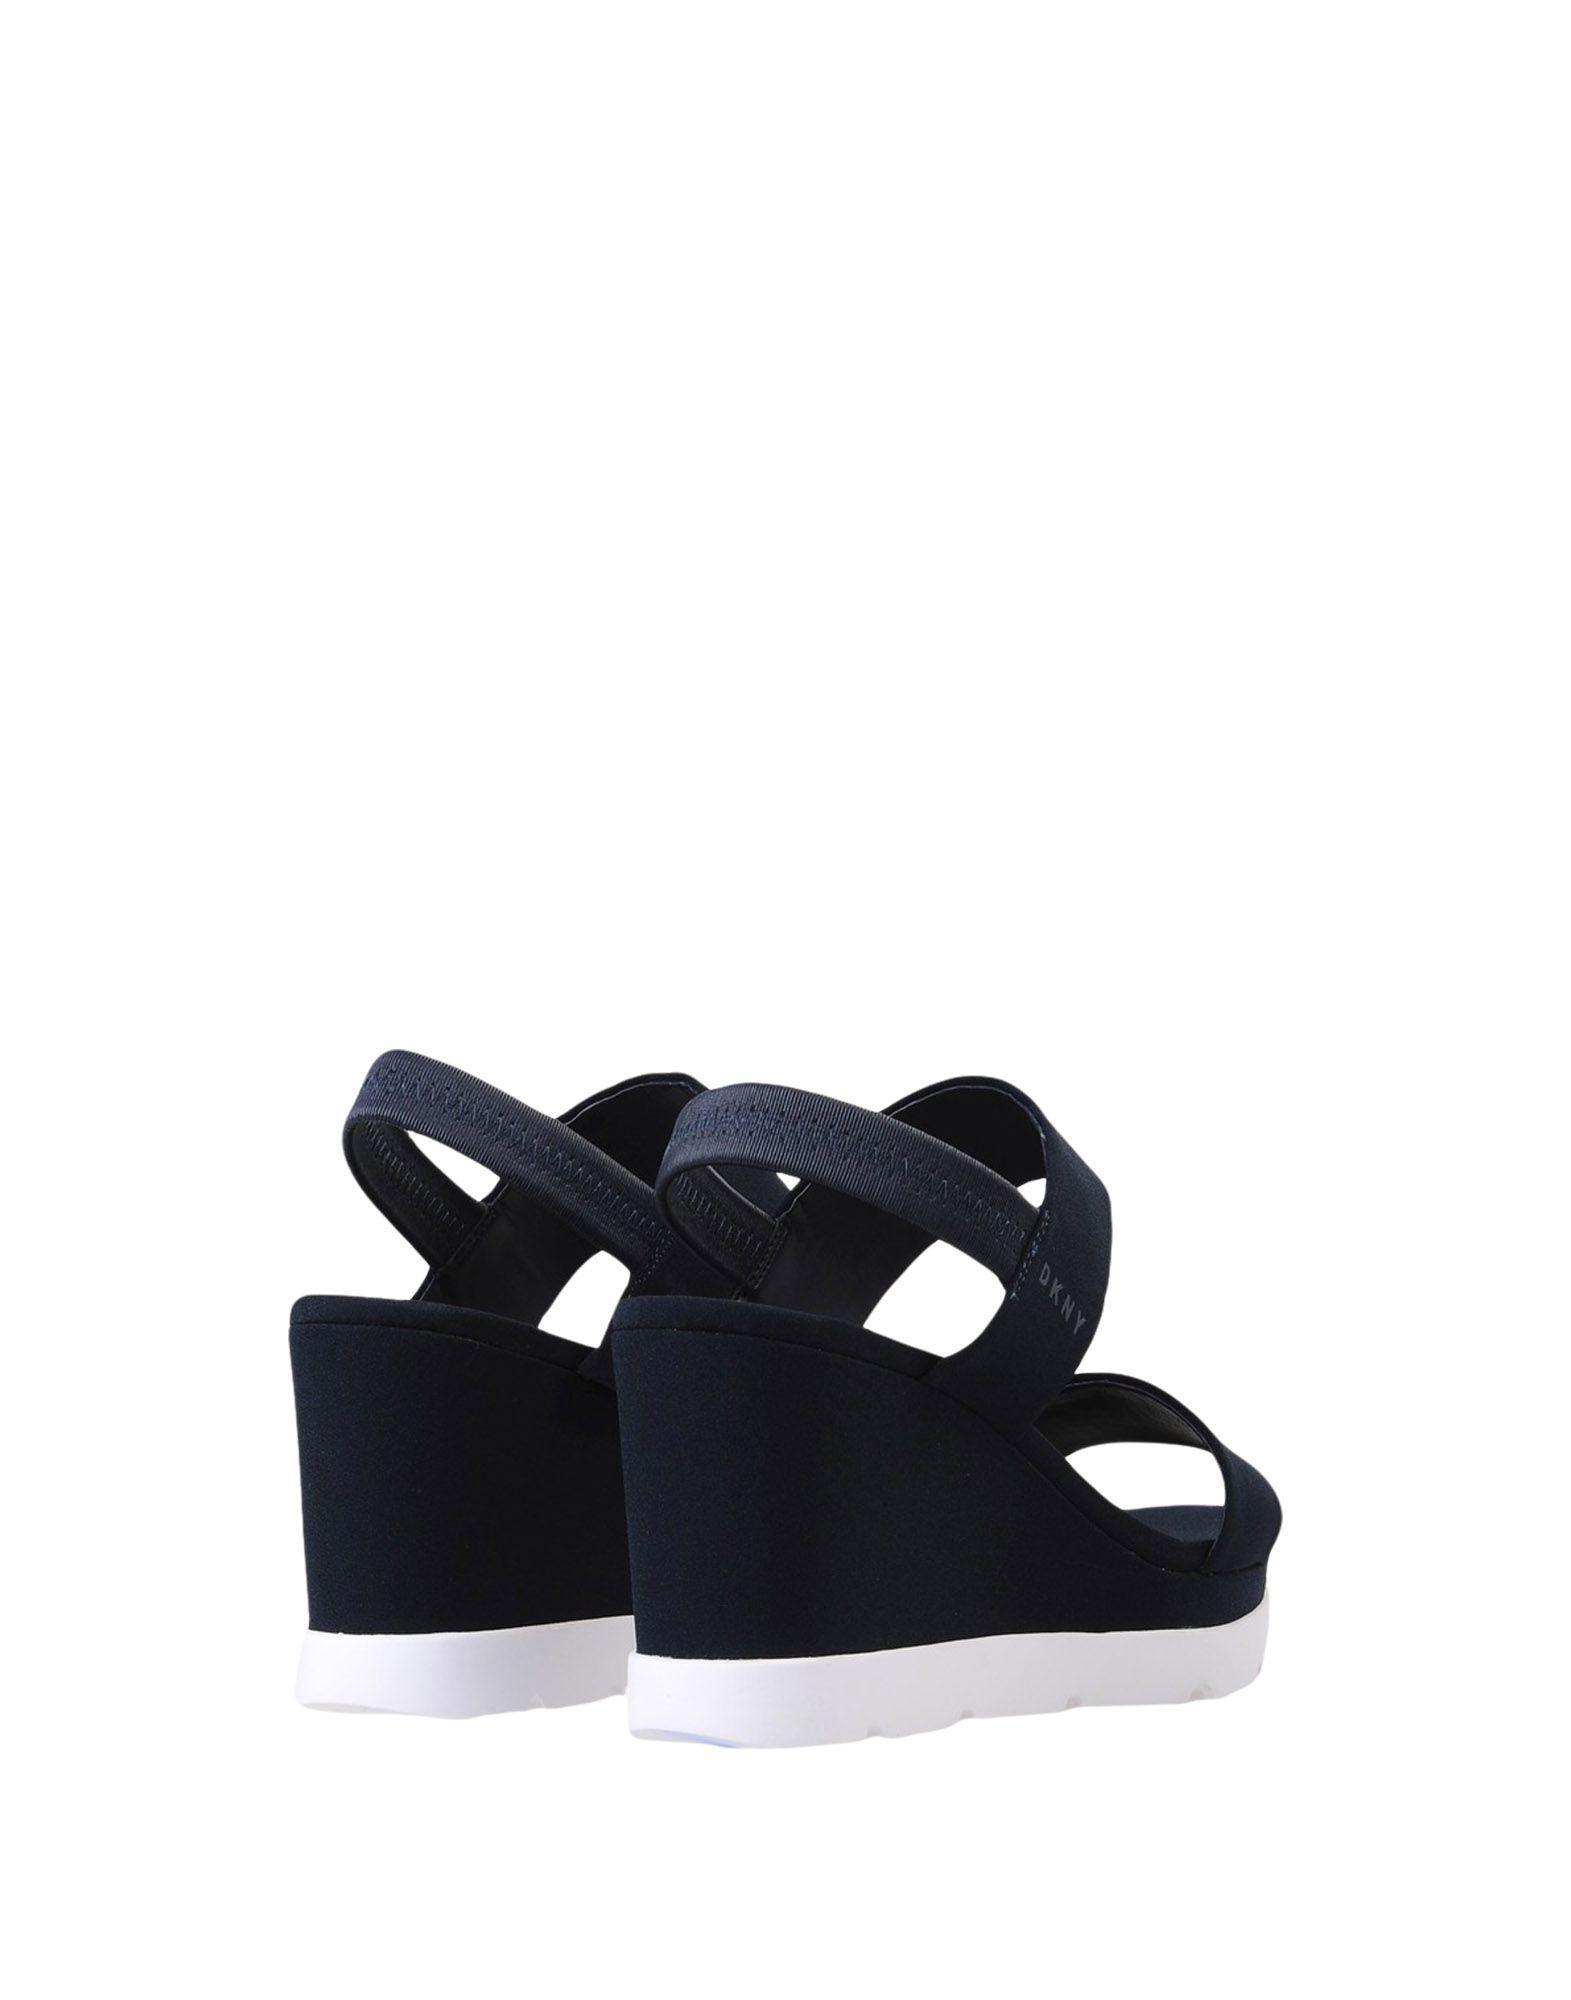 8e695f3c8feb Dkny Sandals in Blue - Lyst